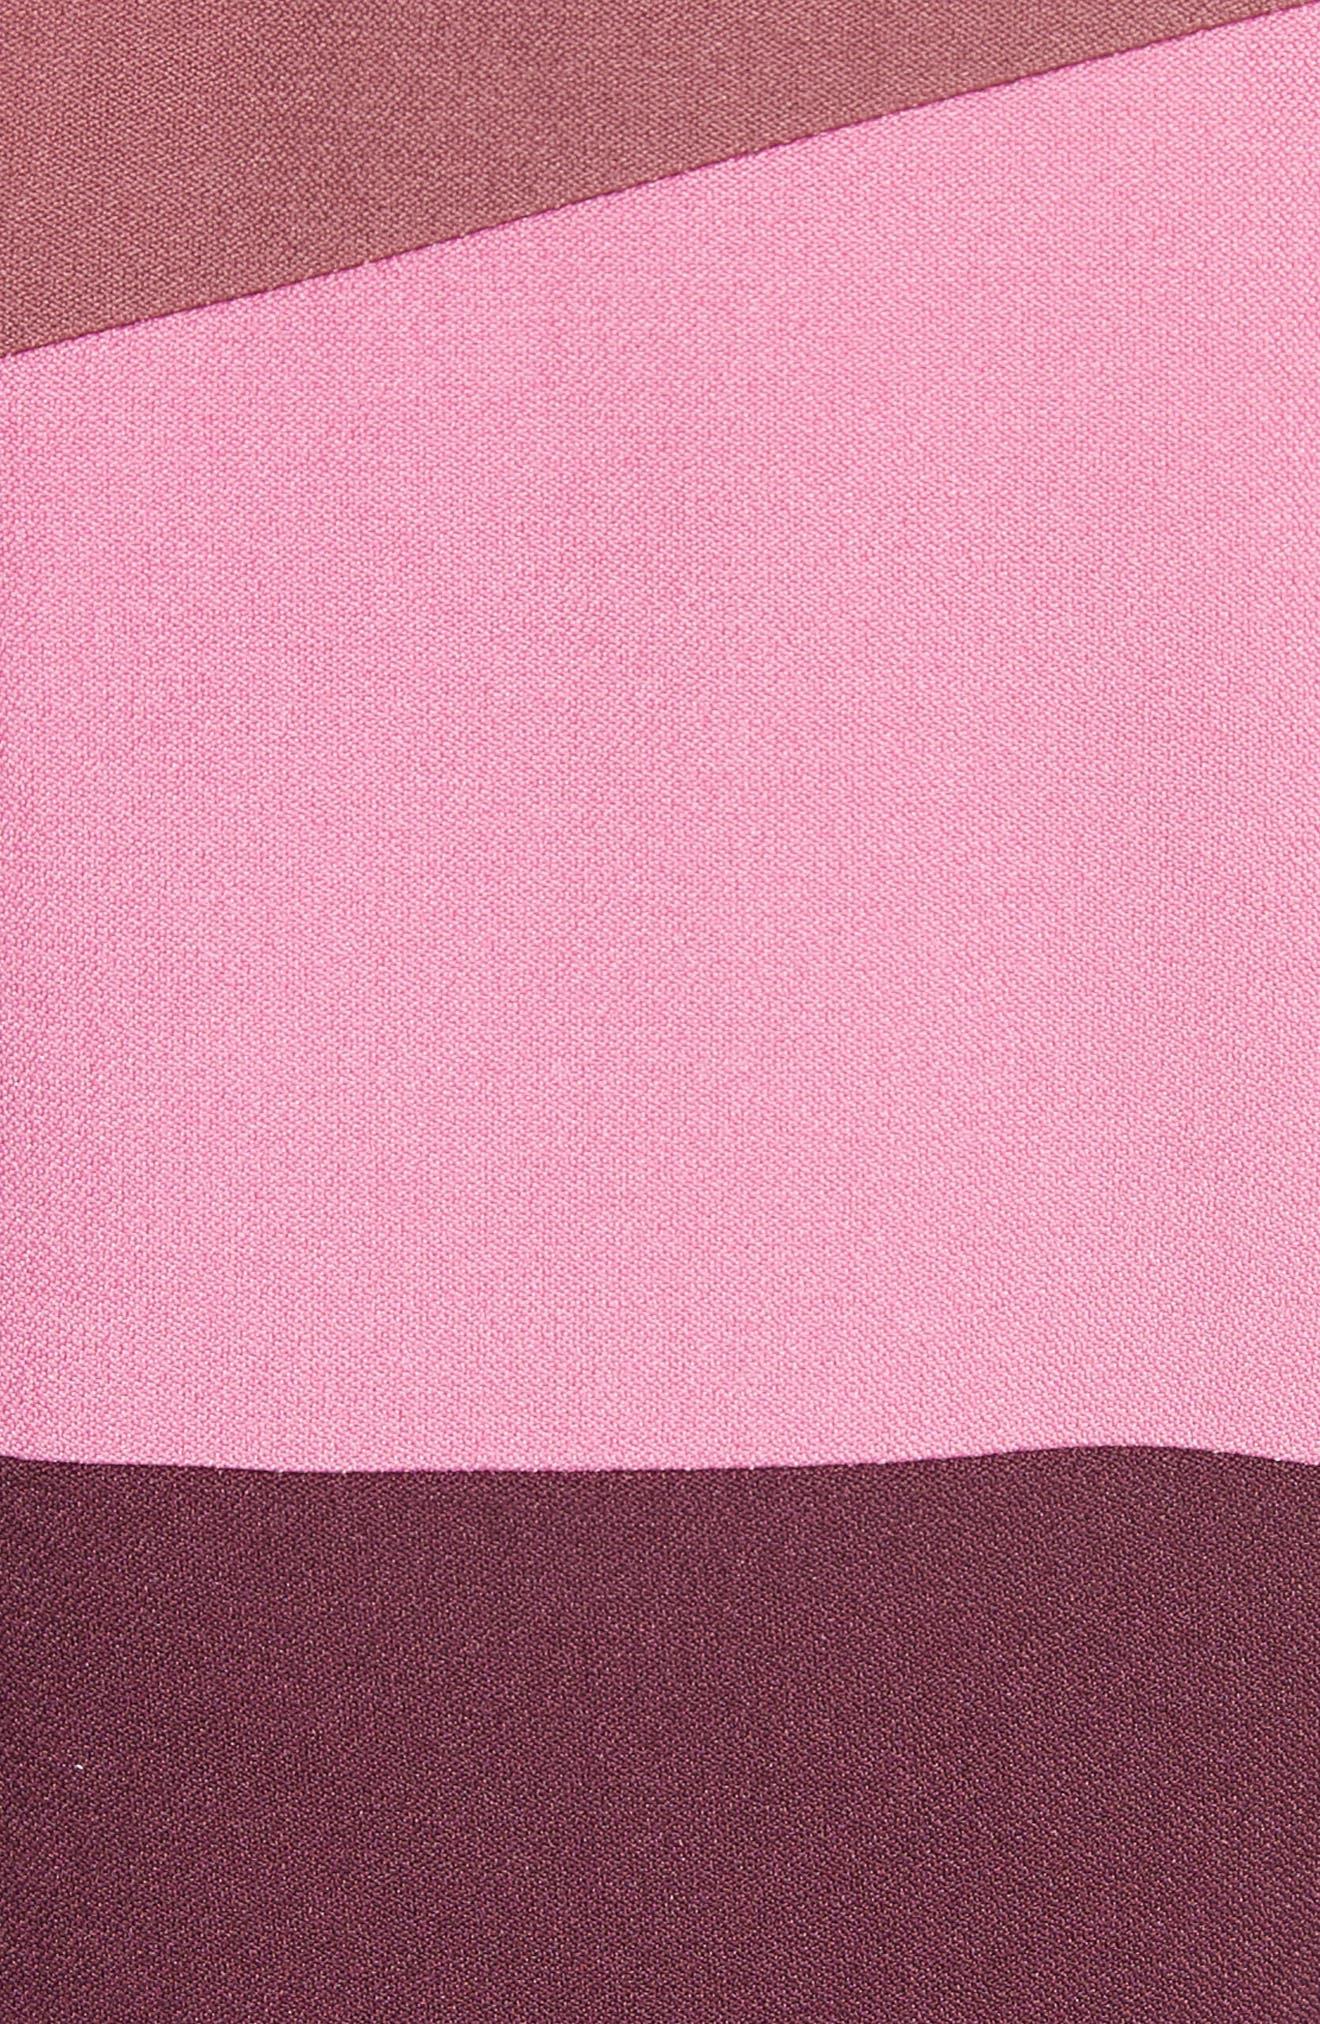 Tatum Stripe Paneled Fit & Flare Dress,                             Alternate thumbnail 6, color,                             Plum/ Blossom/ Mink